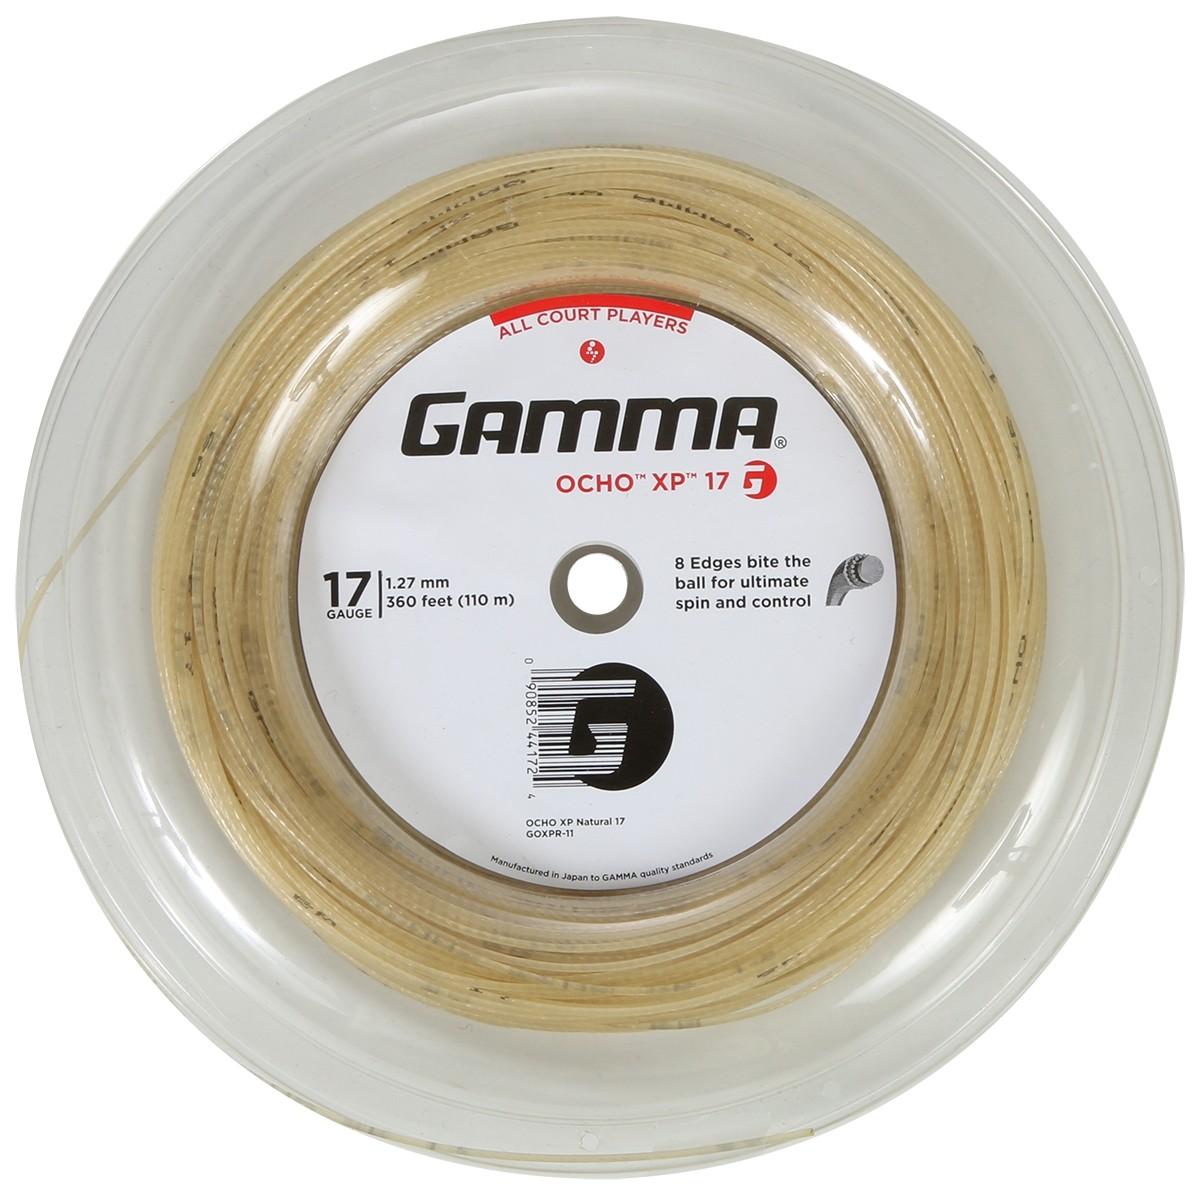 BOBINE GAMMA OCHO XP (110 METRES)